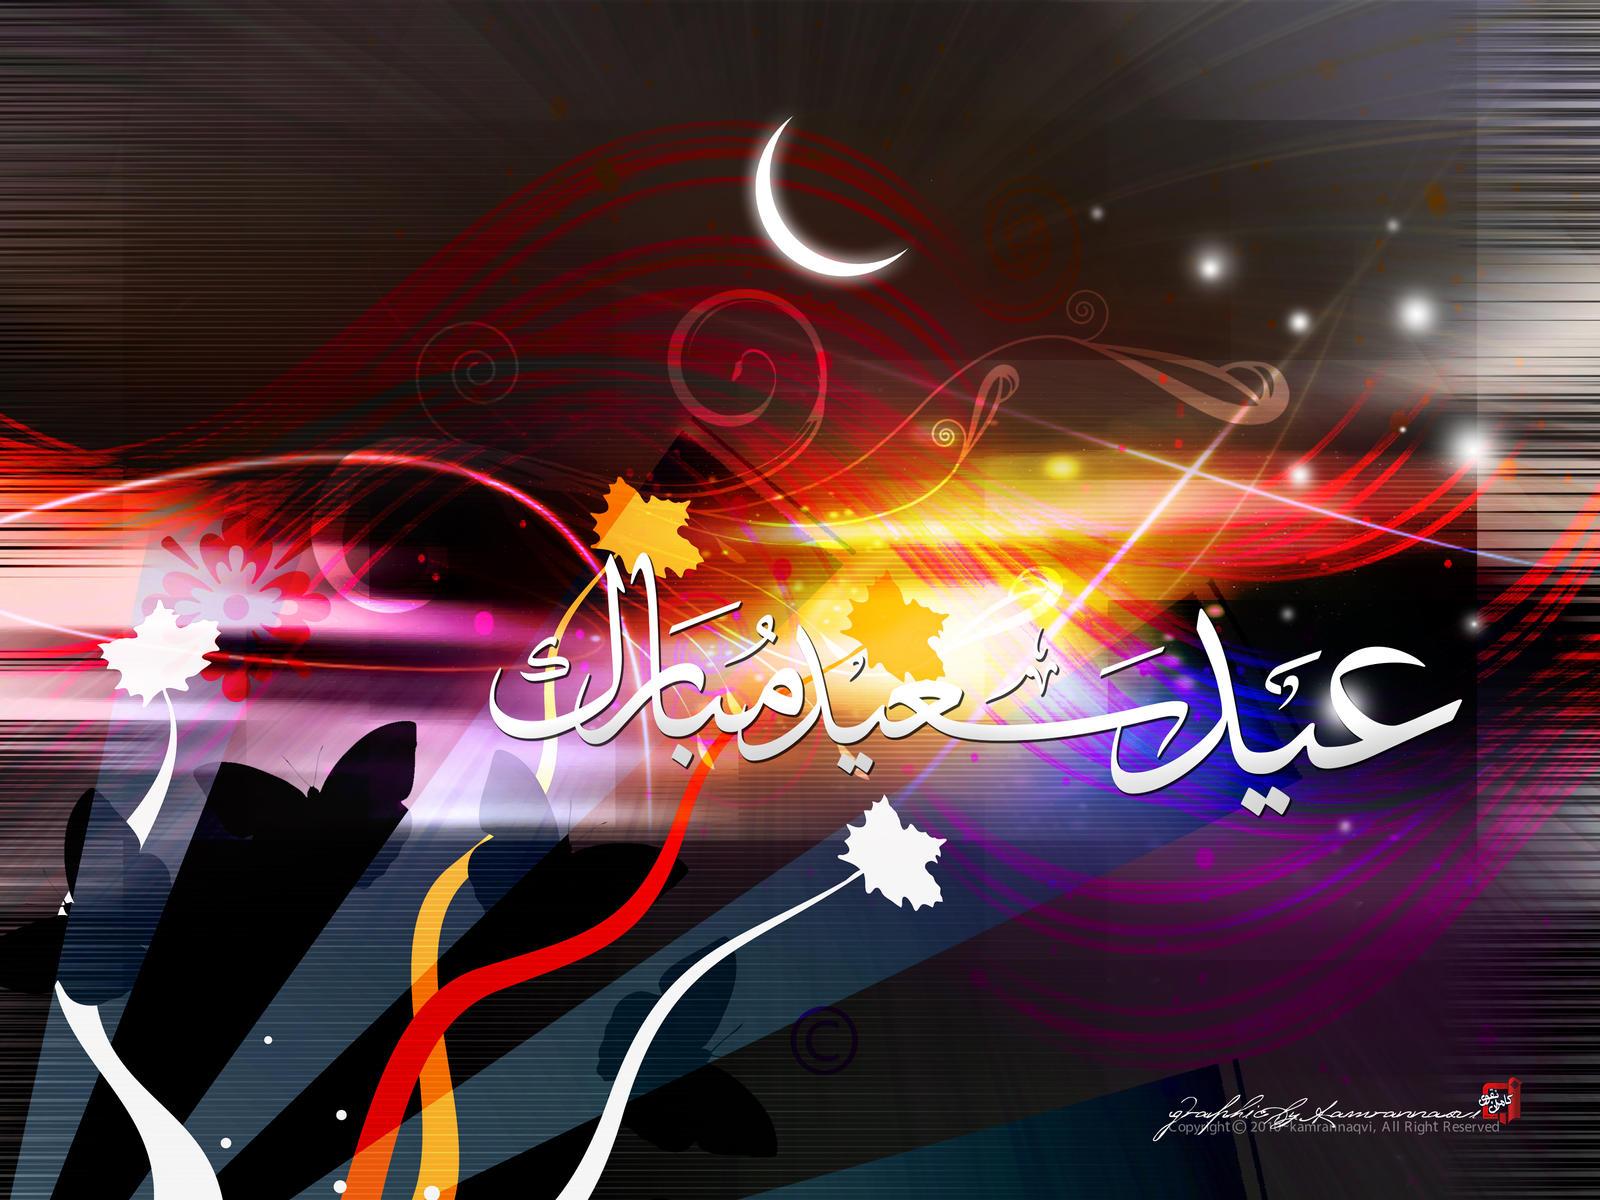 Simple Wallpaper Name Kamran - eid_e_saeed_mubarak_2010_by_kamrannaqvi-d2y861q  Perfect Image Reference_95943.jpg